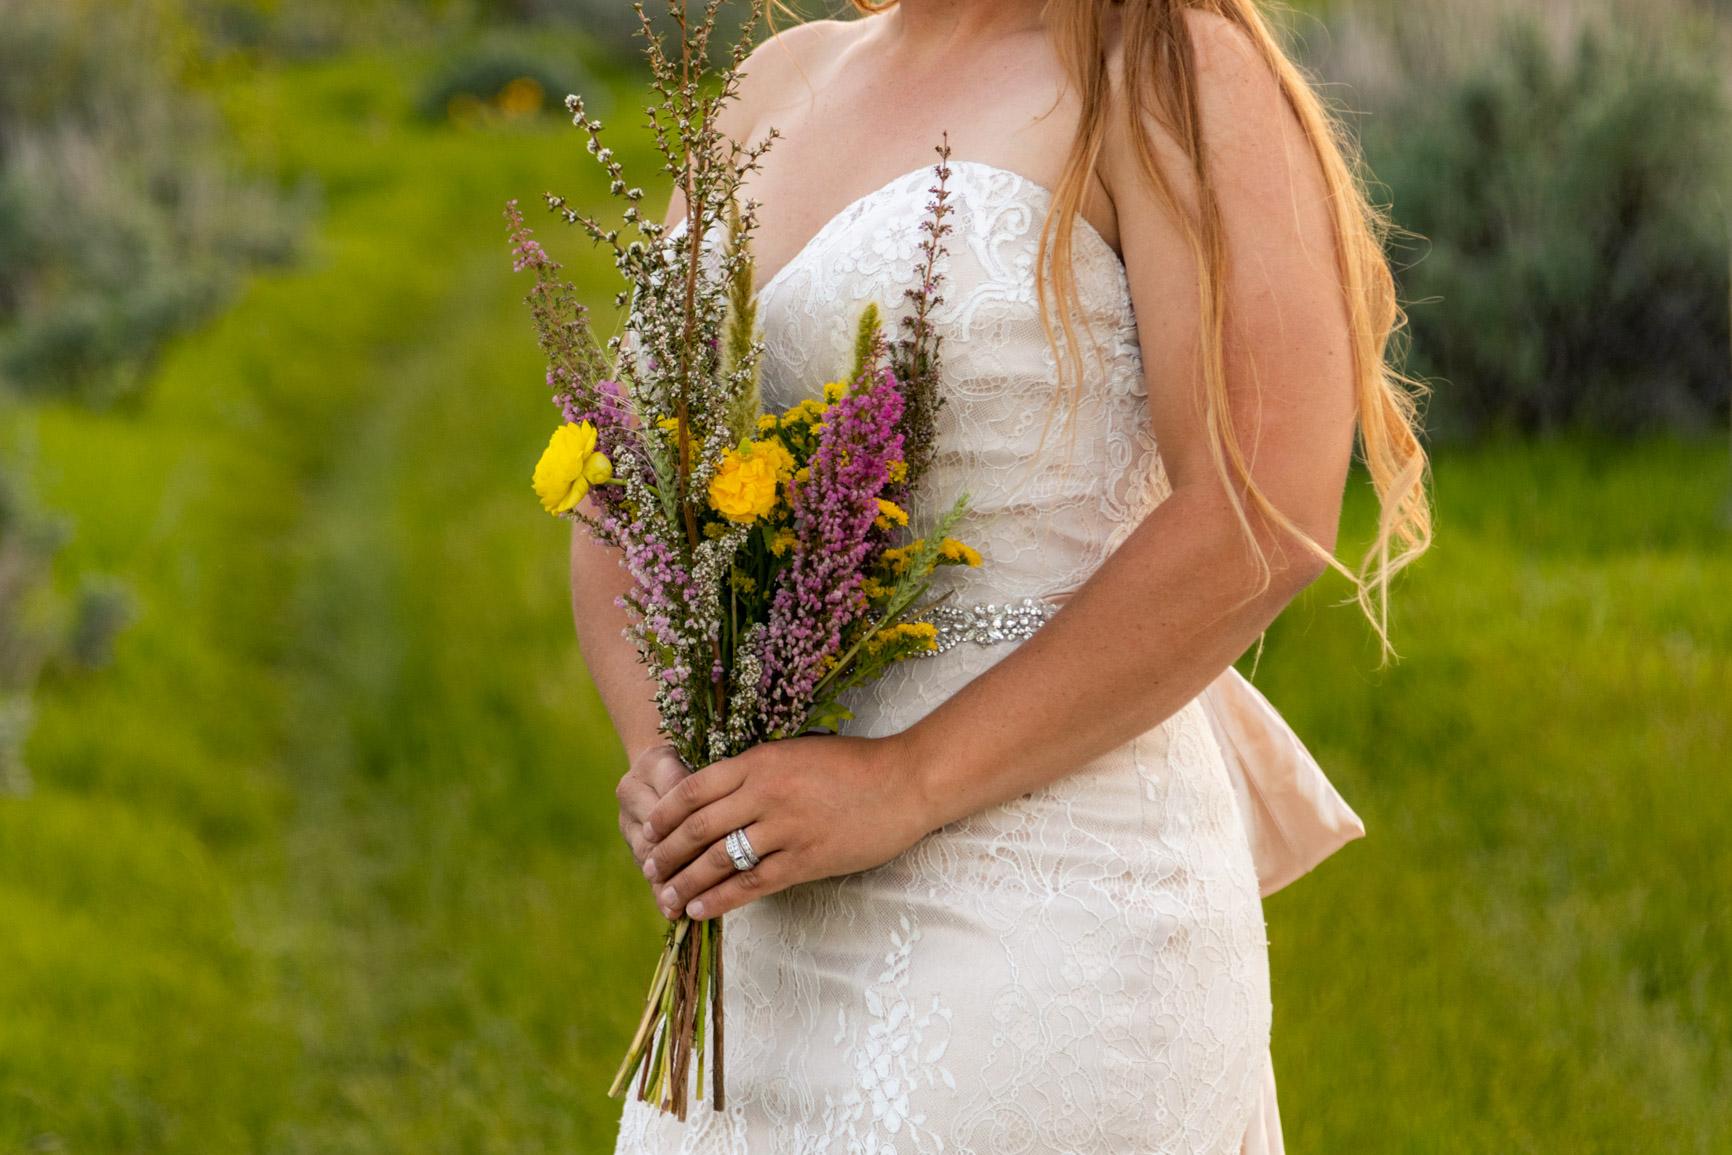 Rustic Wild Wedding Bouquet Elopement Rocky Mountains Wasatch Mountains Utah Halie West Photography 10